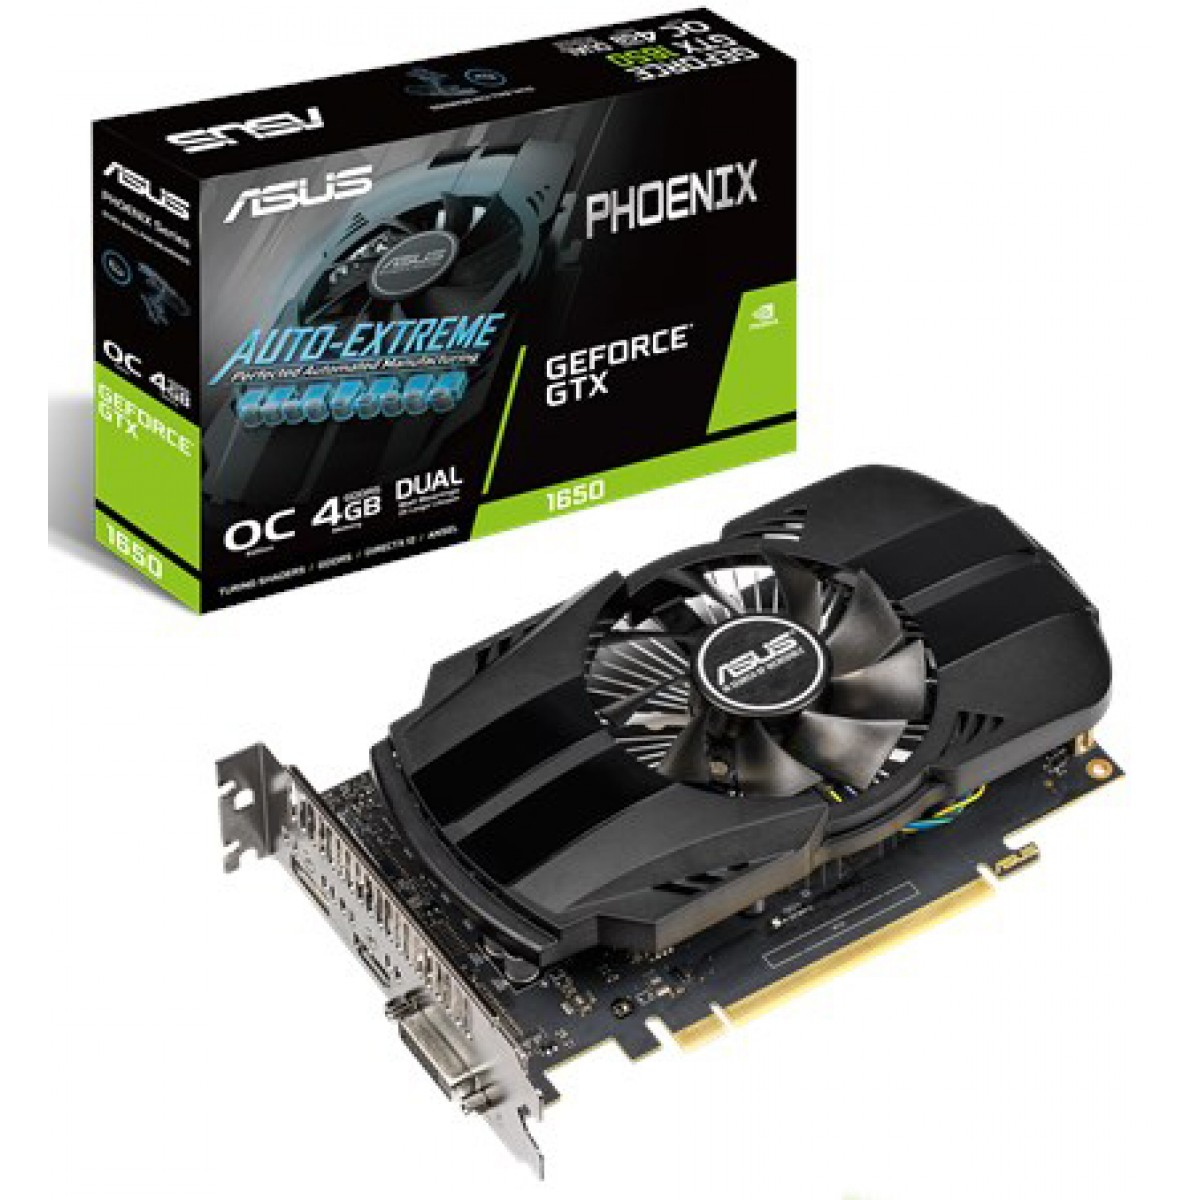 Placa de Video Asus, GeForce, GTX 1650 OC, 4GB, GDDR5, 128Bit, PH-GTX1650-O4G